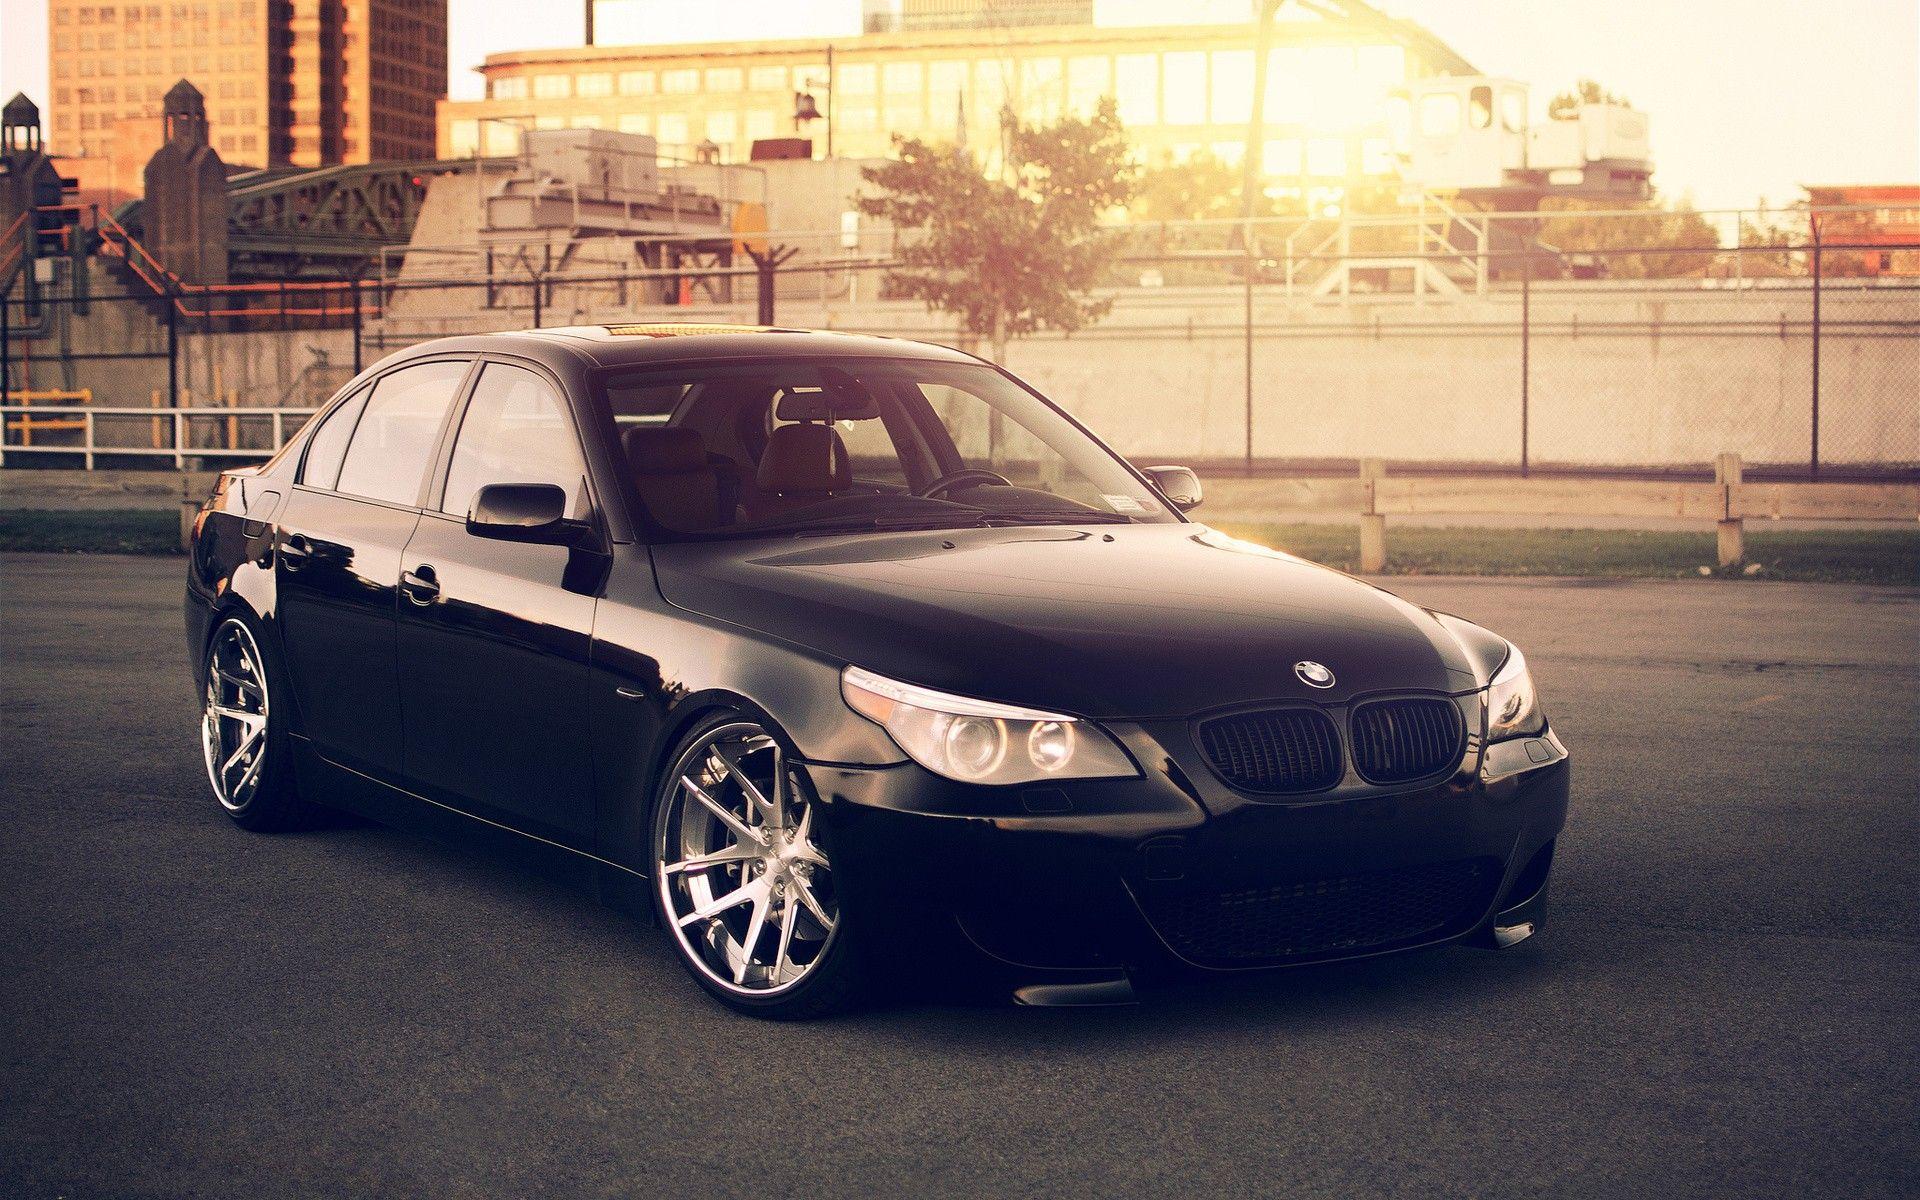 Black BMW M5 with big rims